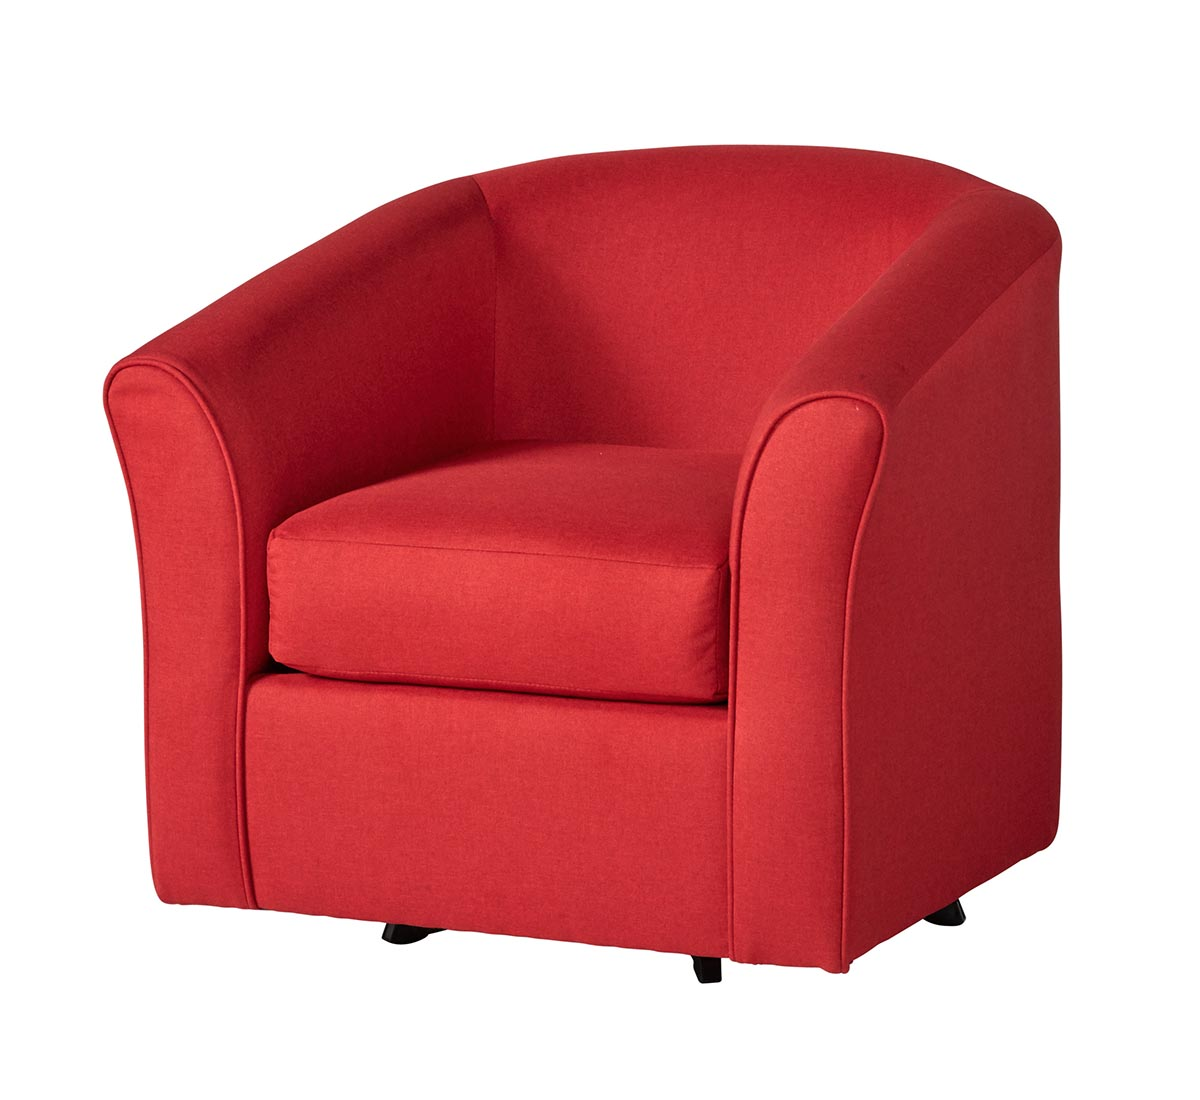 89 Swivel Chair